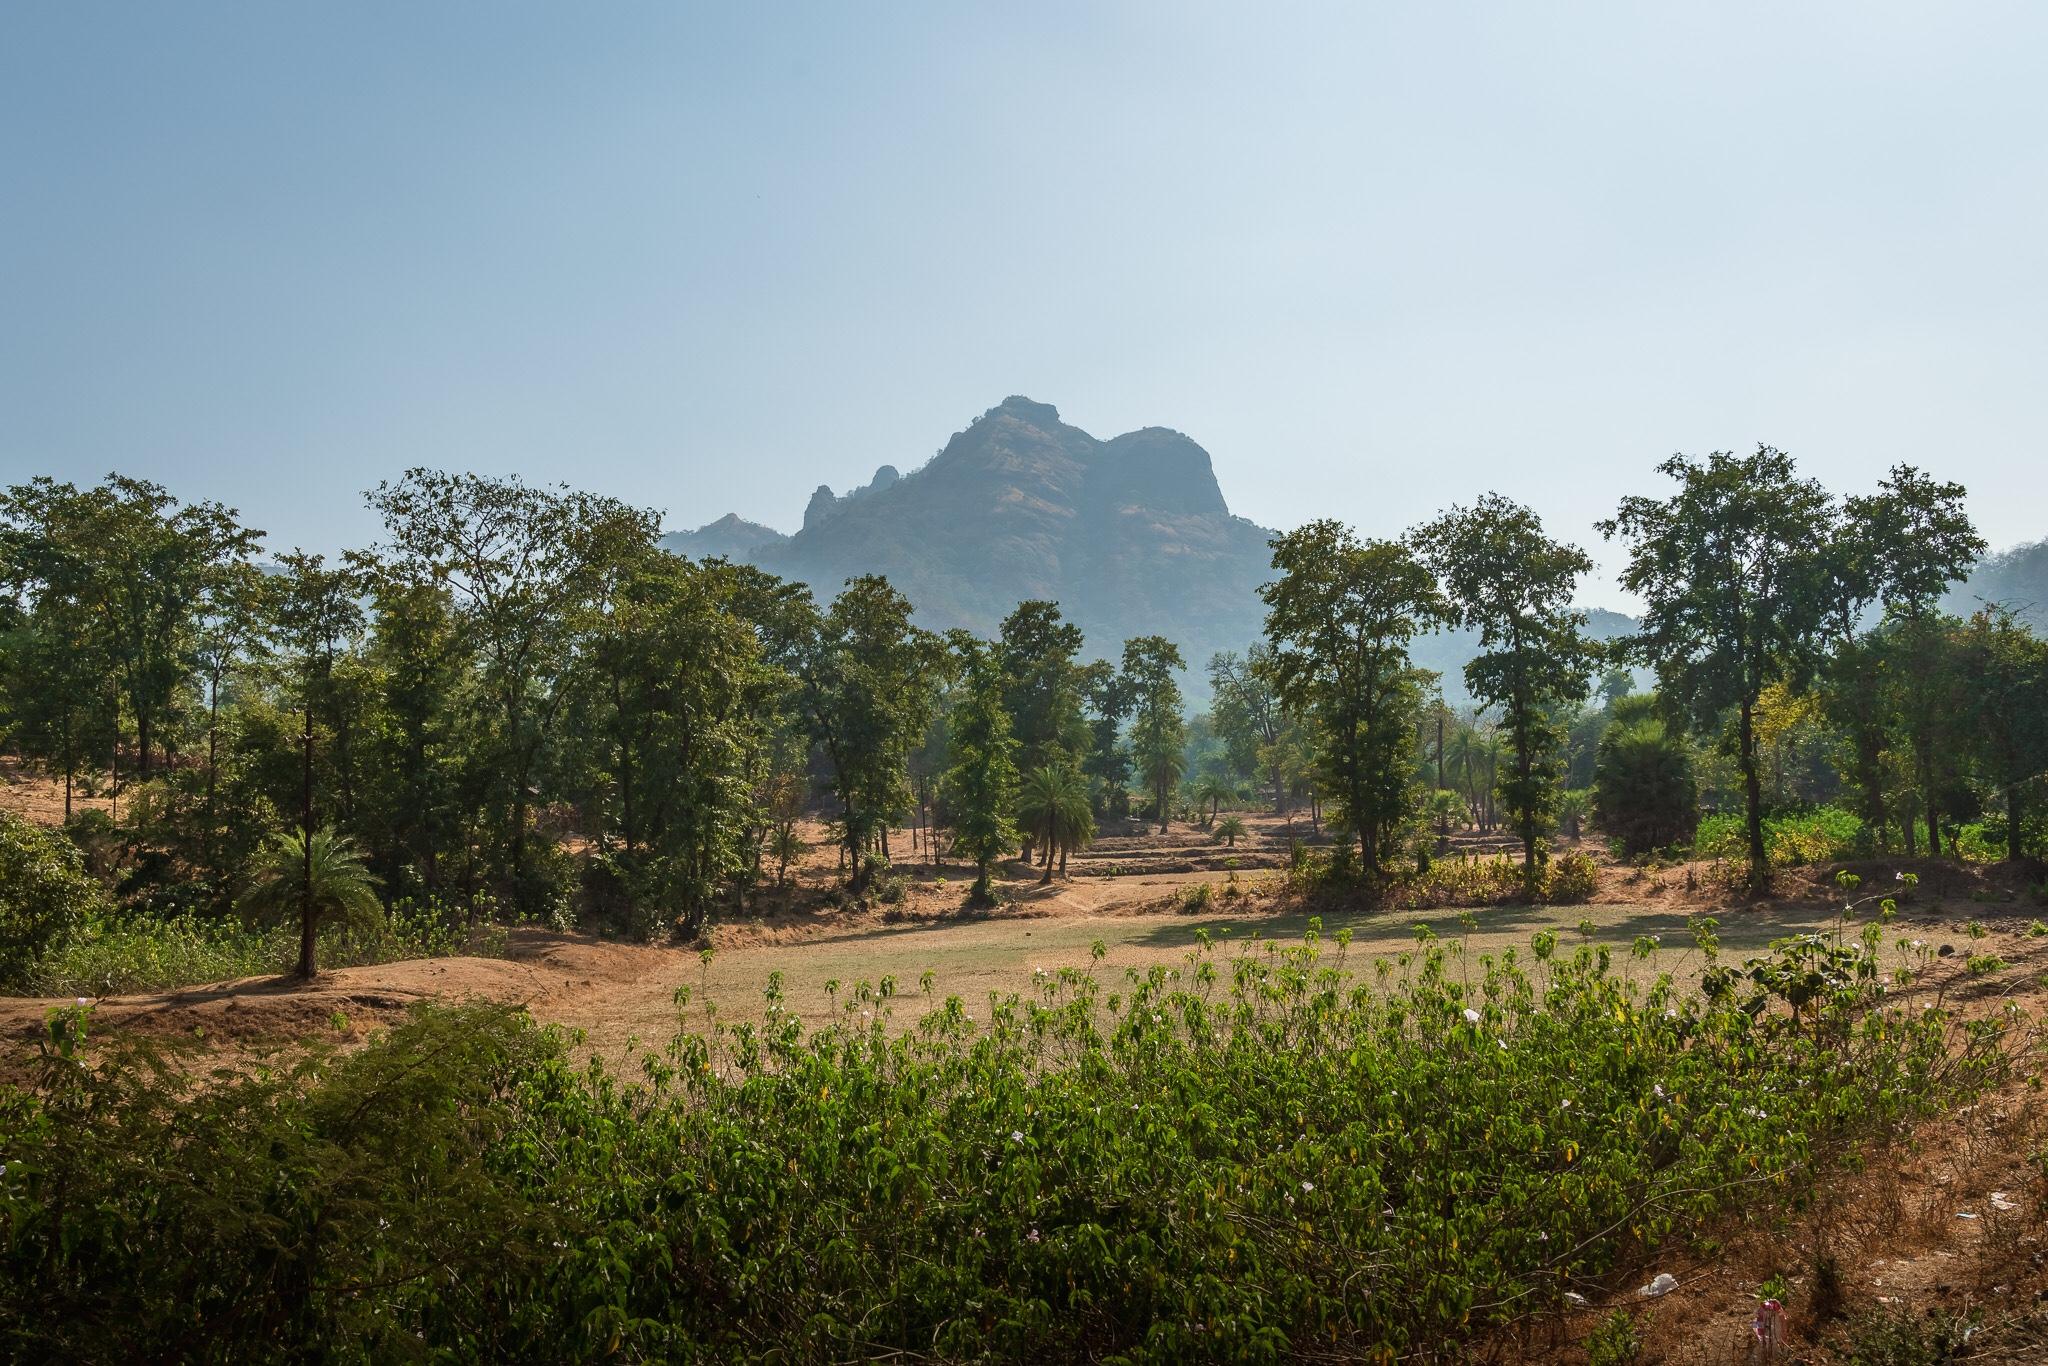 First glimpse of Maharashtra